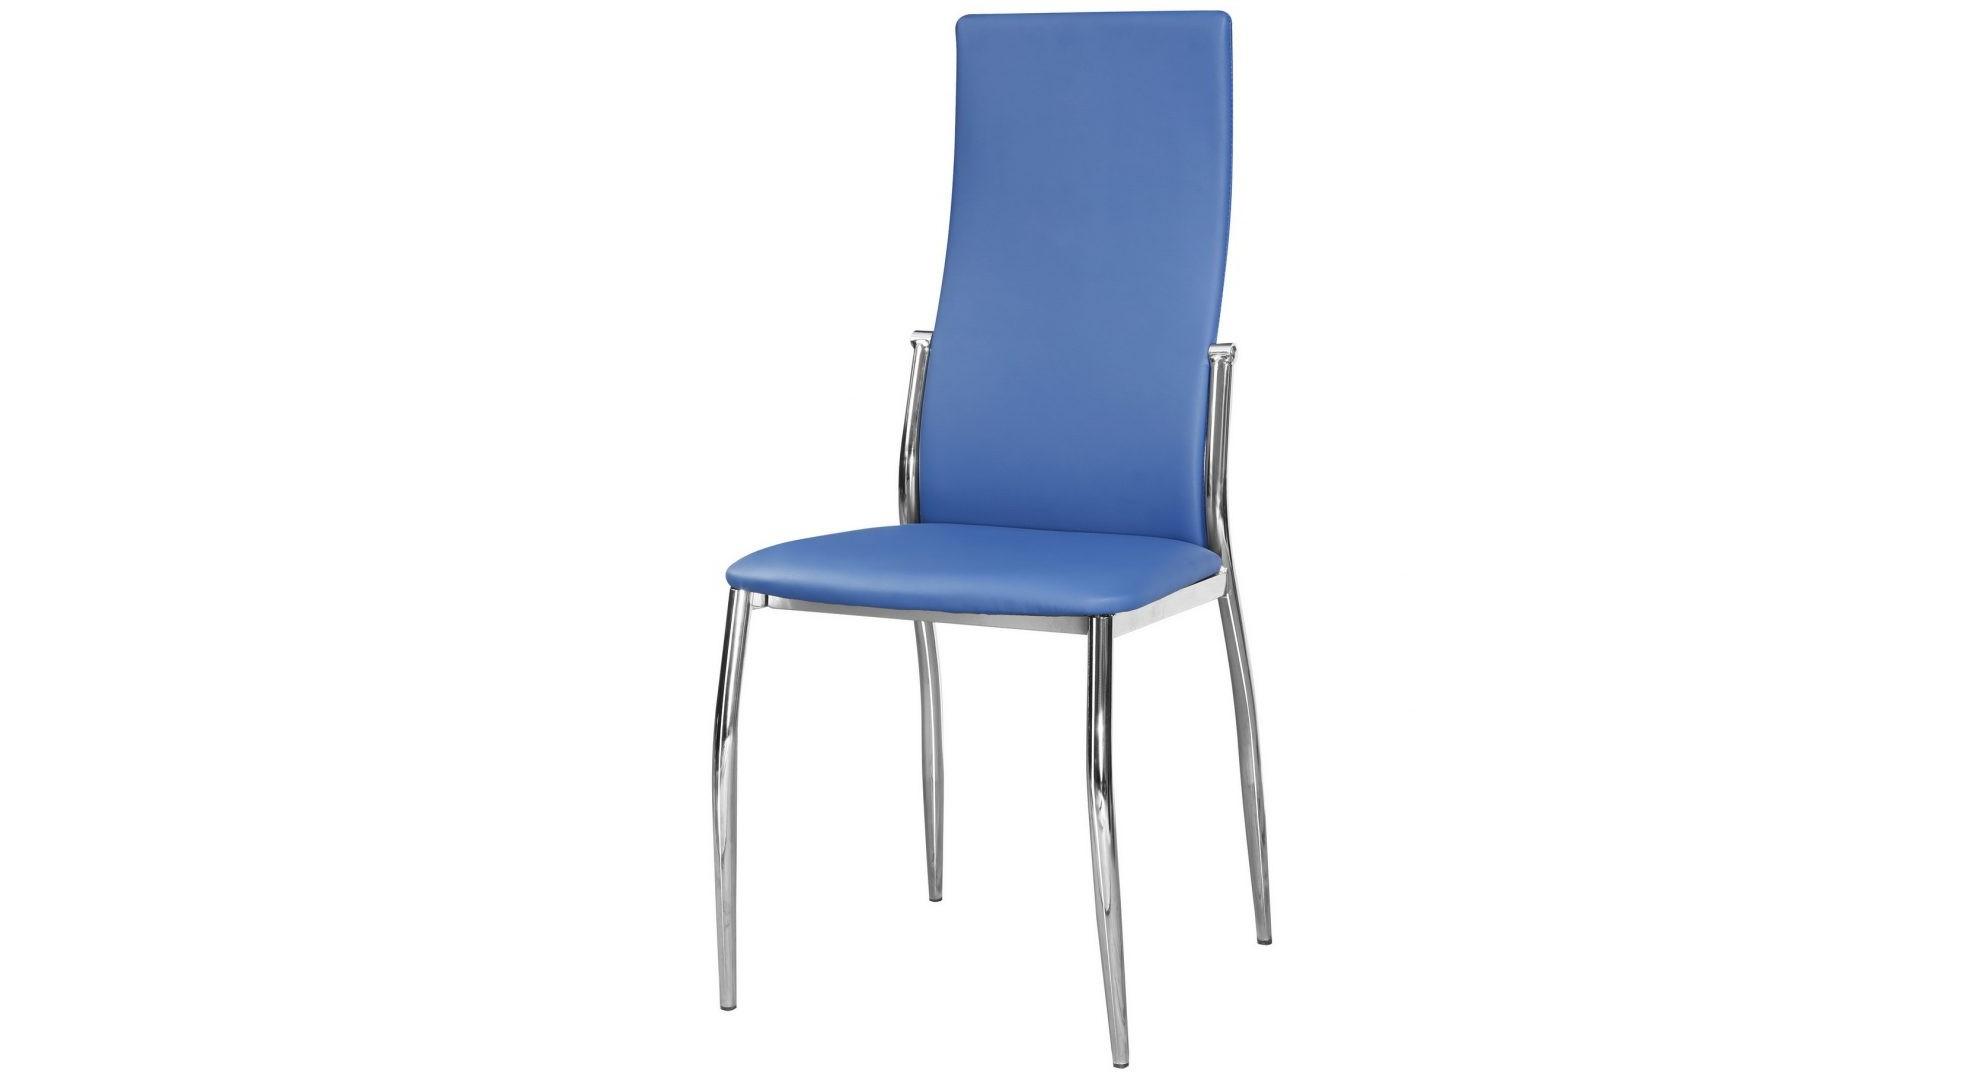 СтулОбеденные стулья<br><br><br>Material: Кожа<br>Width см: 45<br>Depth см: 51<br>Height см: 100